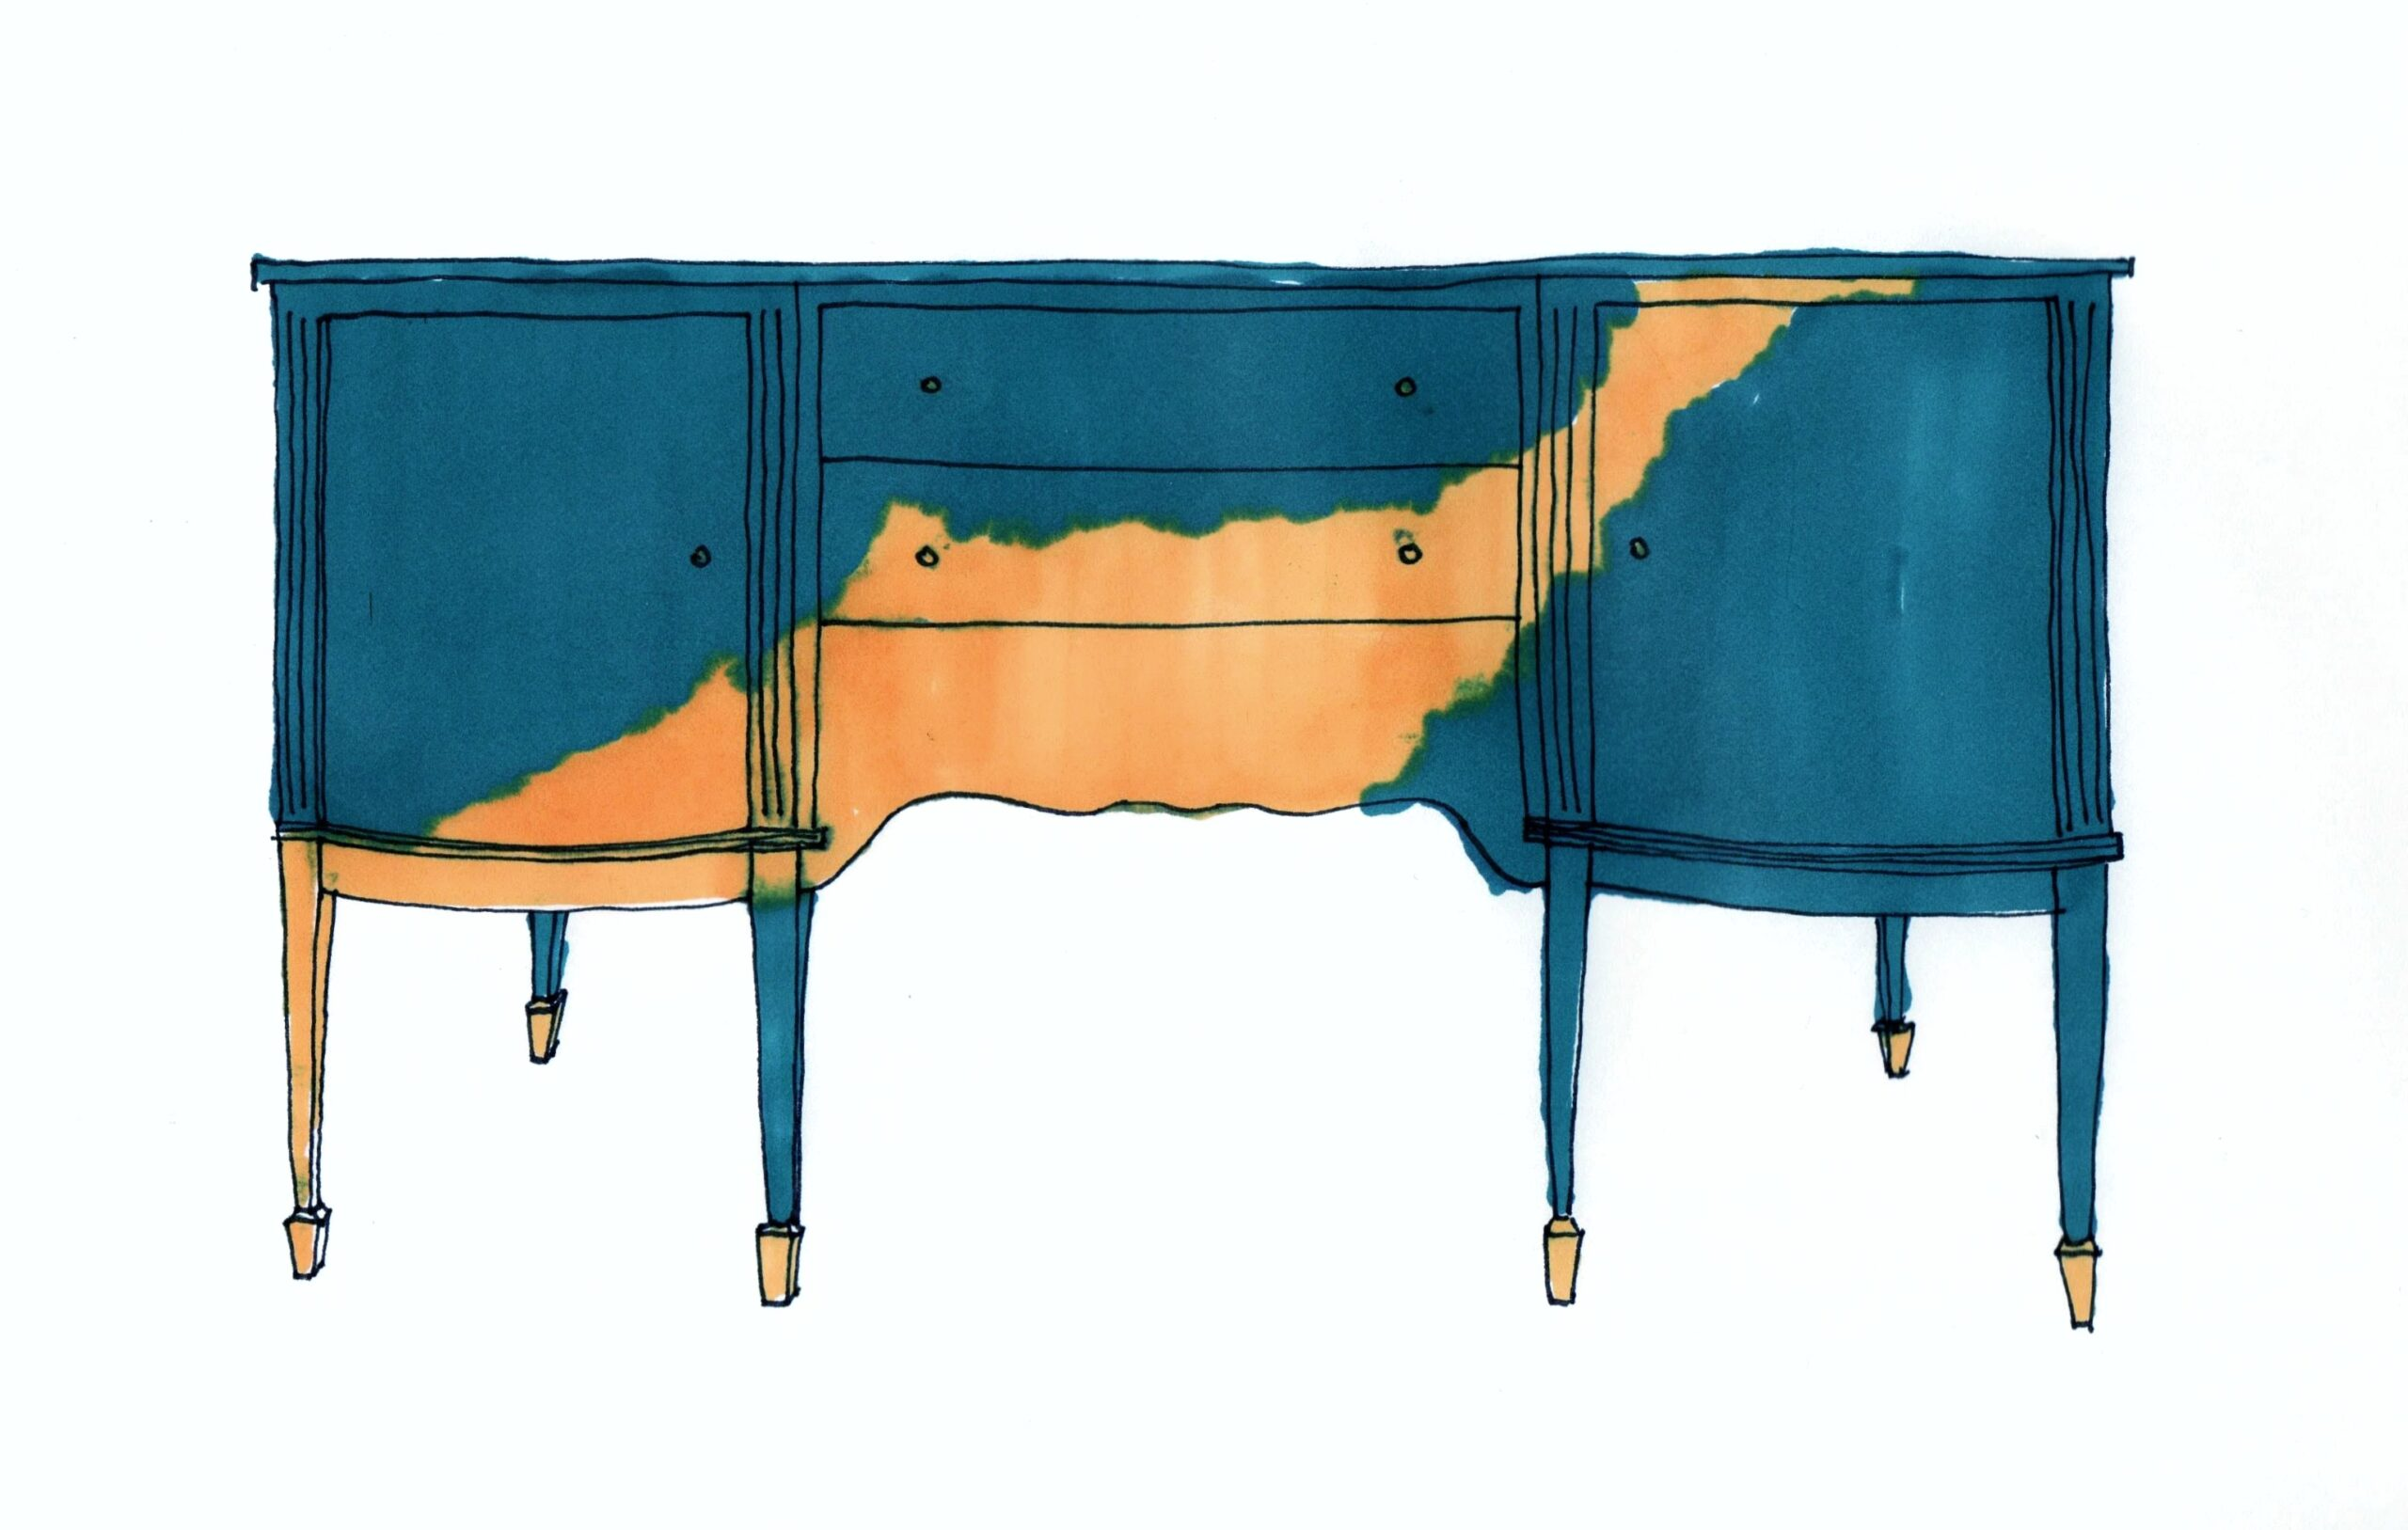 Lazuli : Concept sketch